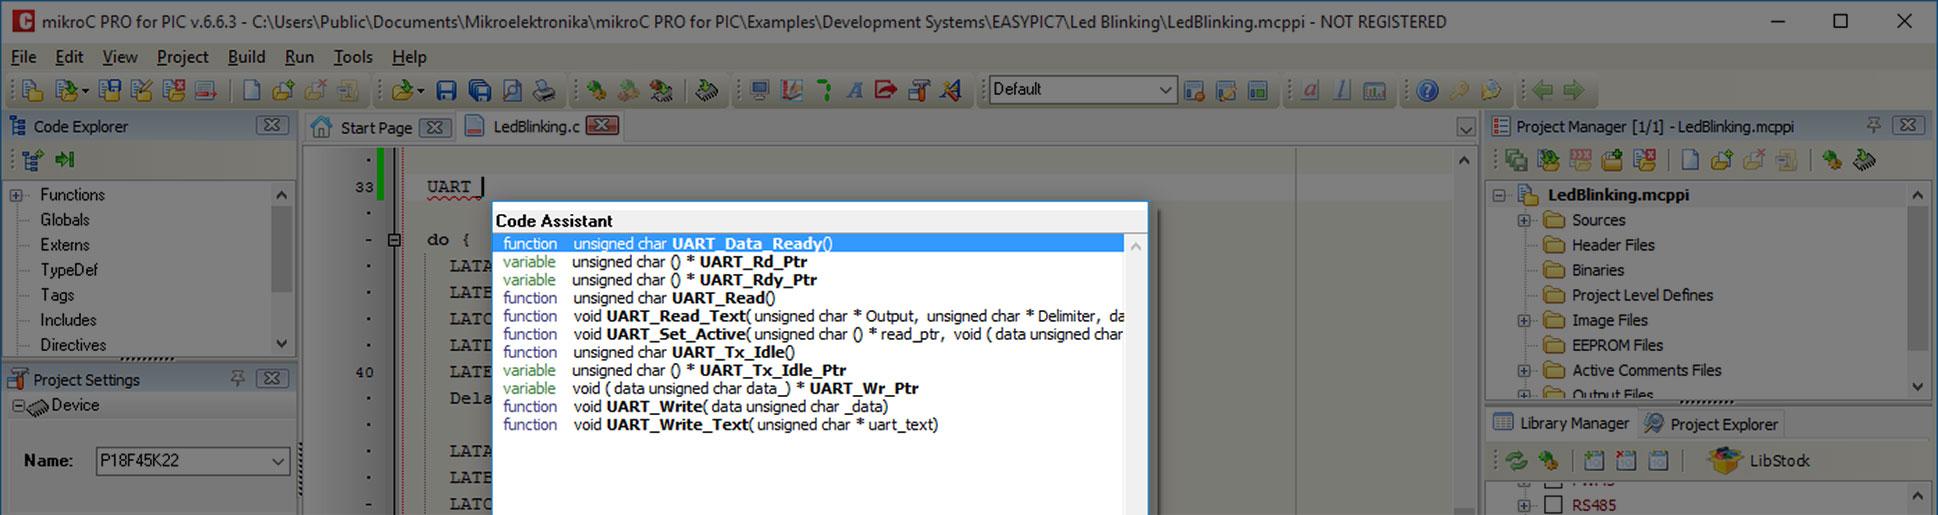 MikroElektronika Code Assistant